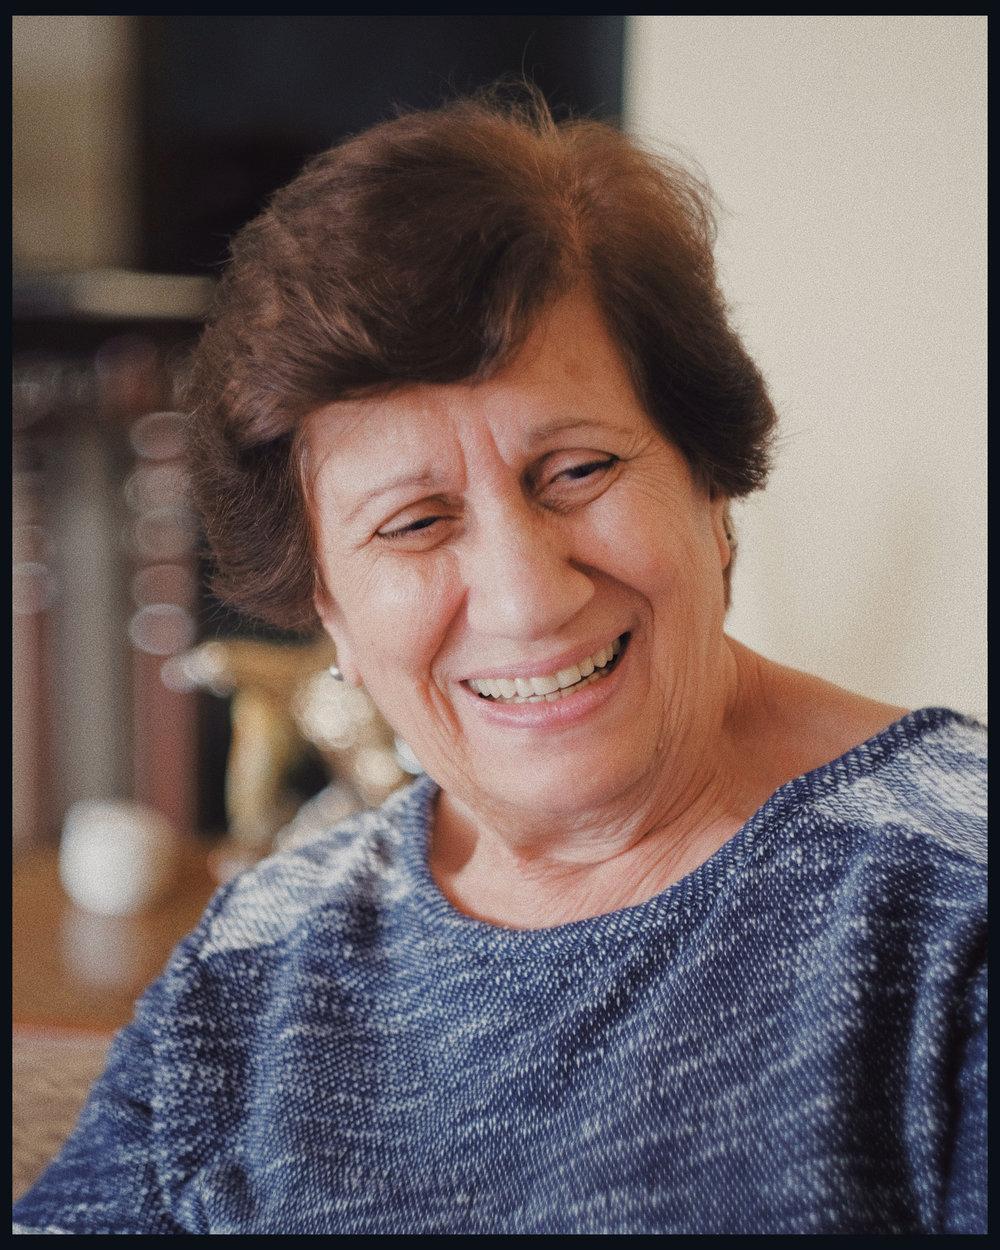 Mirey Saadeh de Sayegh, retratada por Adrián Diaz